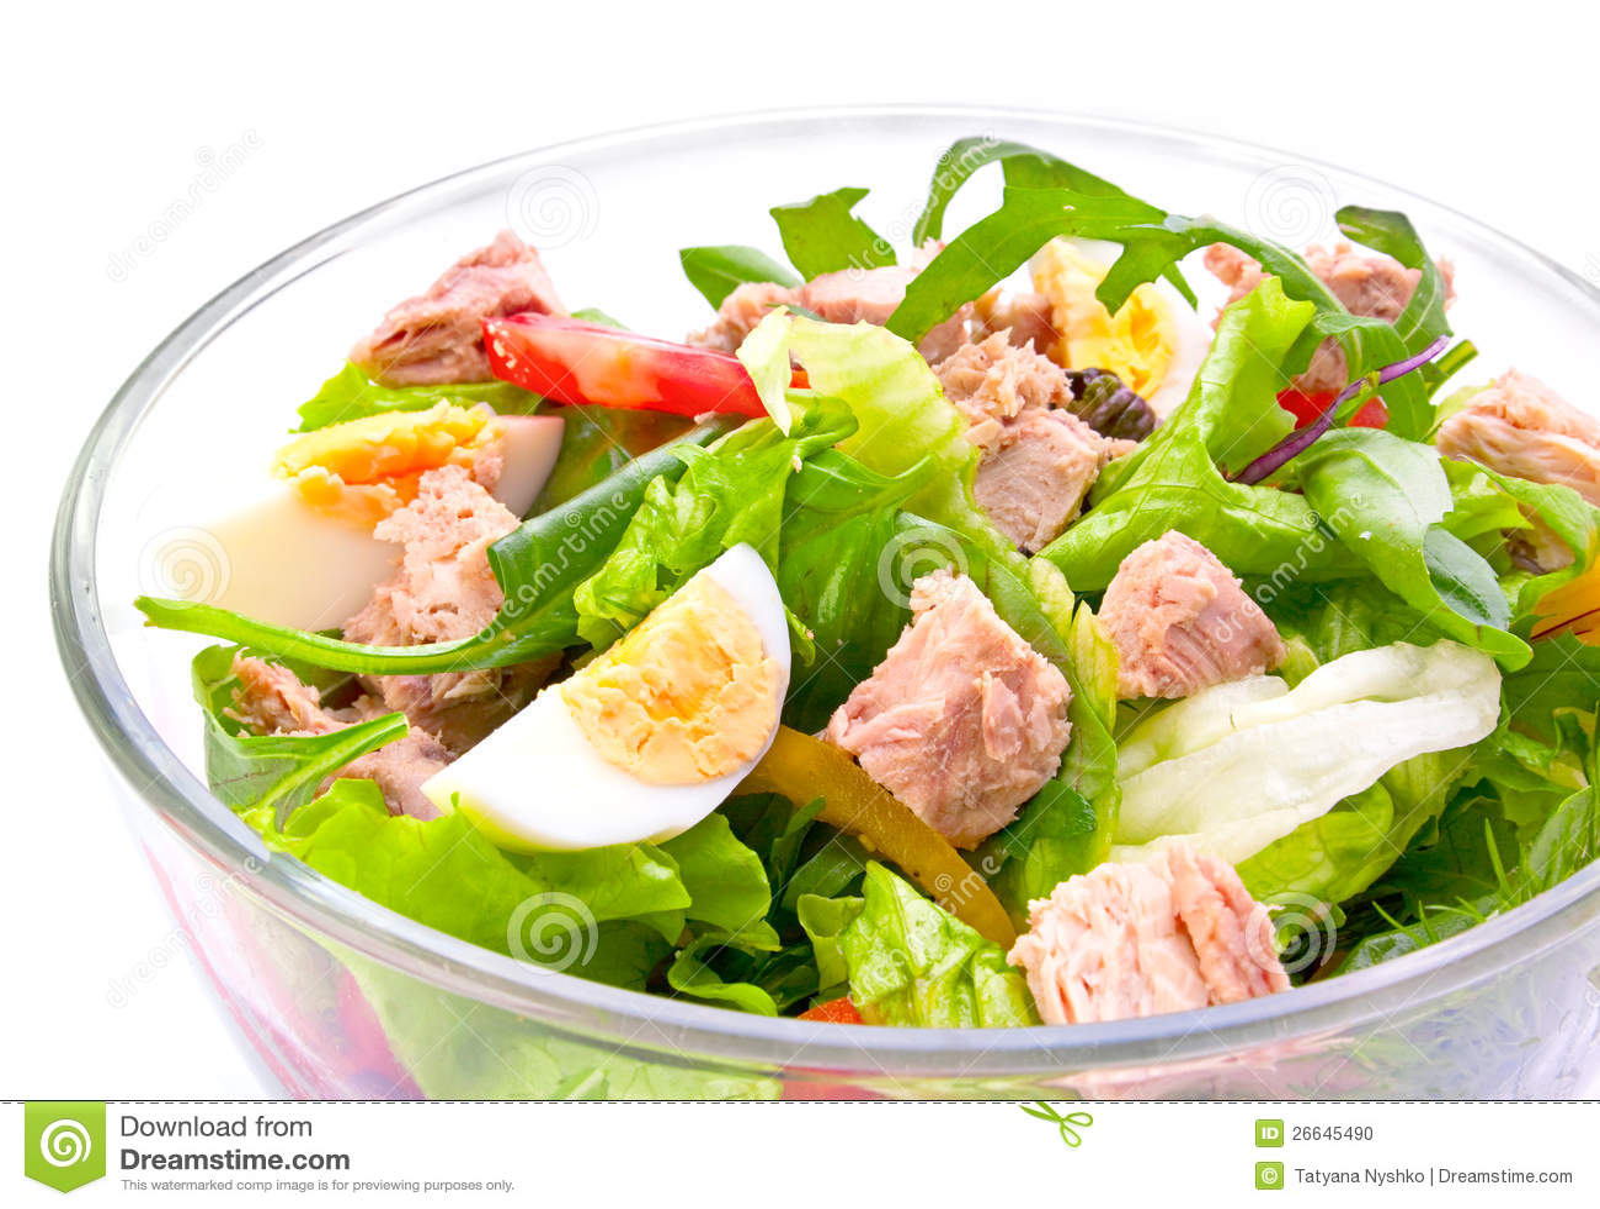 Tuna fish salad recipes dishmaps for Tuna fish salad calories